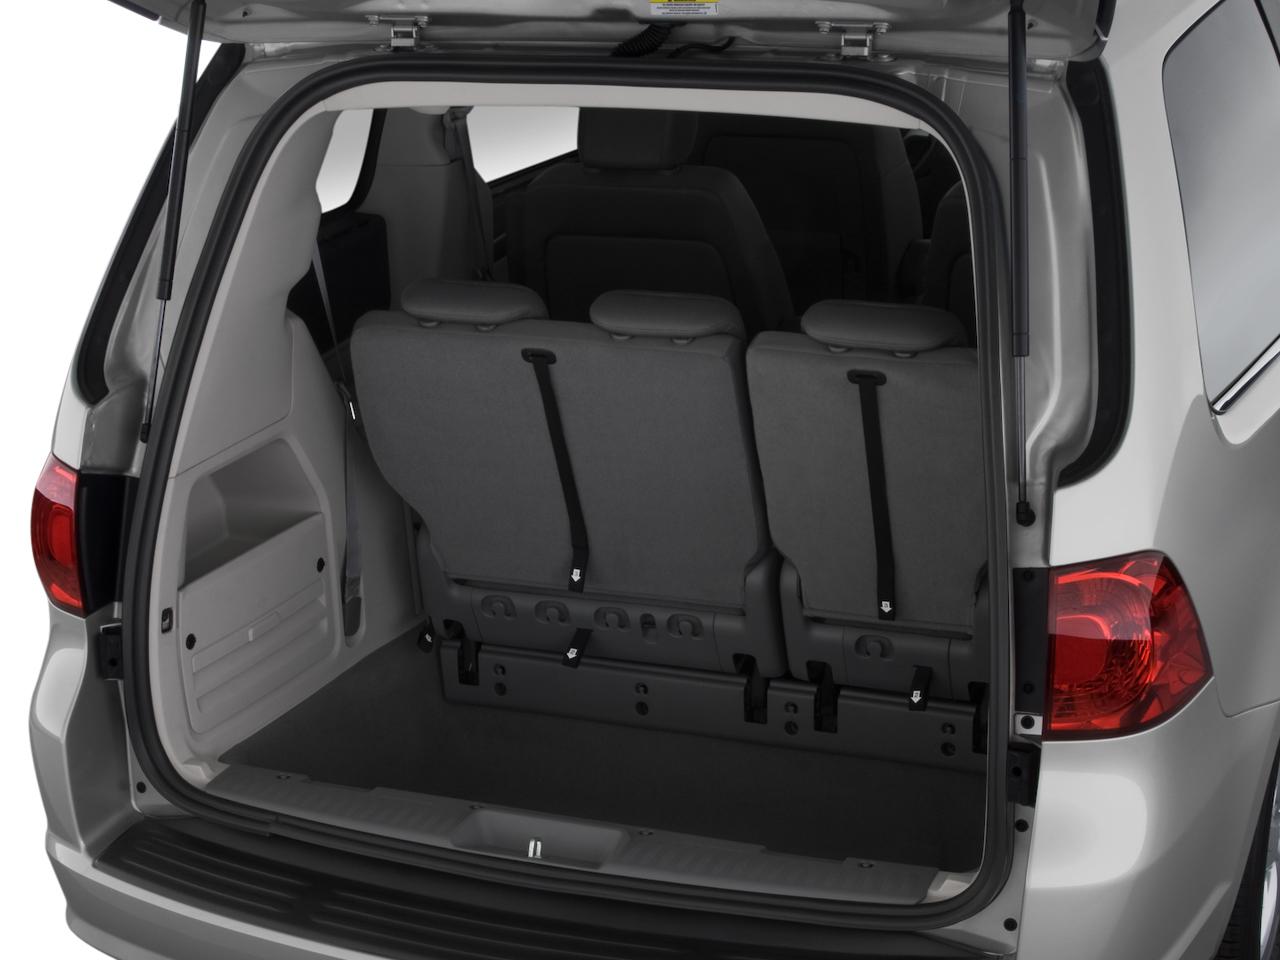 2014 volkswagen routan 2017 2018 best cars reviews. Black Bedroom Furniture Sets. Home Design Ideas